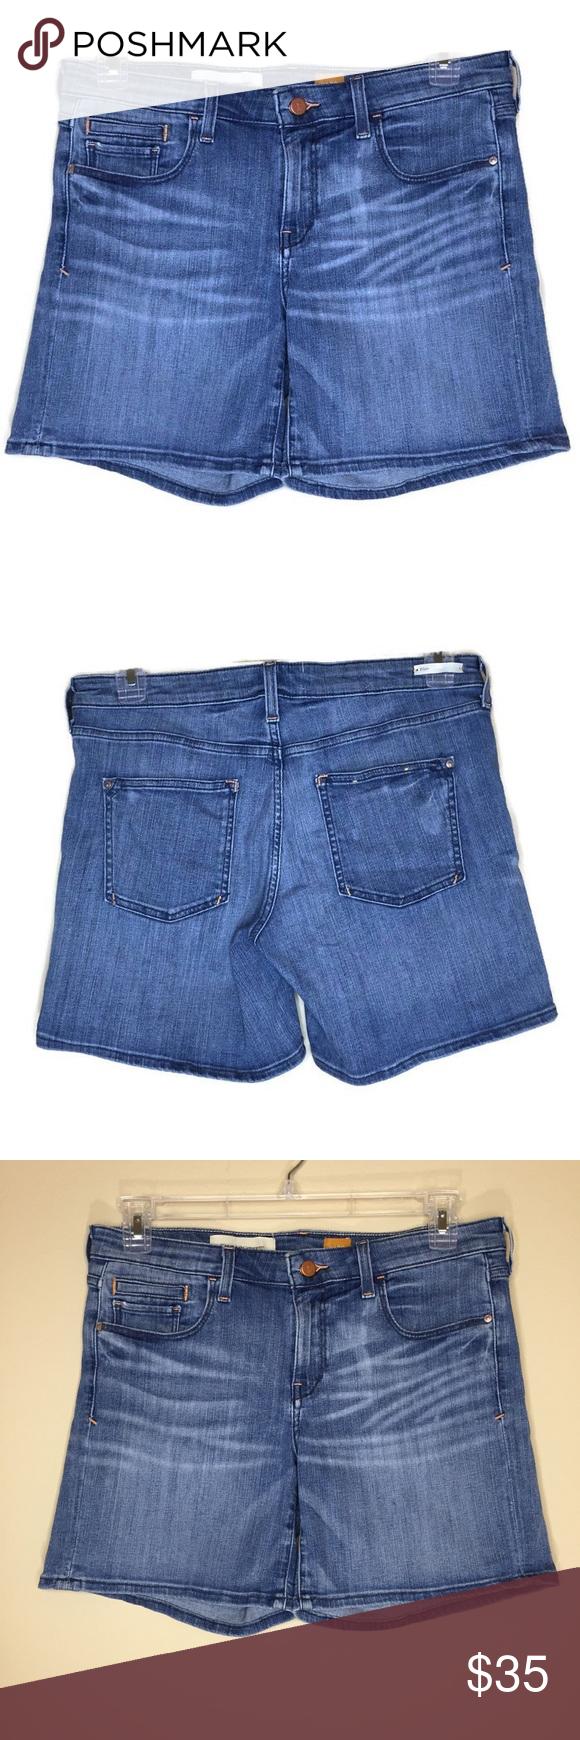 "613d4379df0 Pilcro and the Letterpress Denim Shorts Waist 34 EUC Pilcro and the  Letterpress medium wash denim shorts. Fit/Stet, No. 30. Waist 34, Rise 9"",  Inseam 6""."